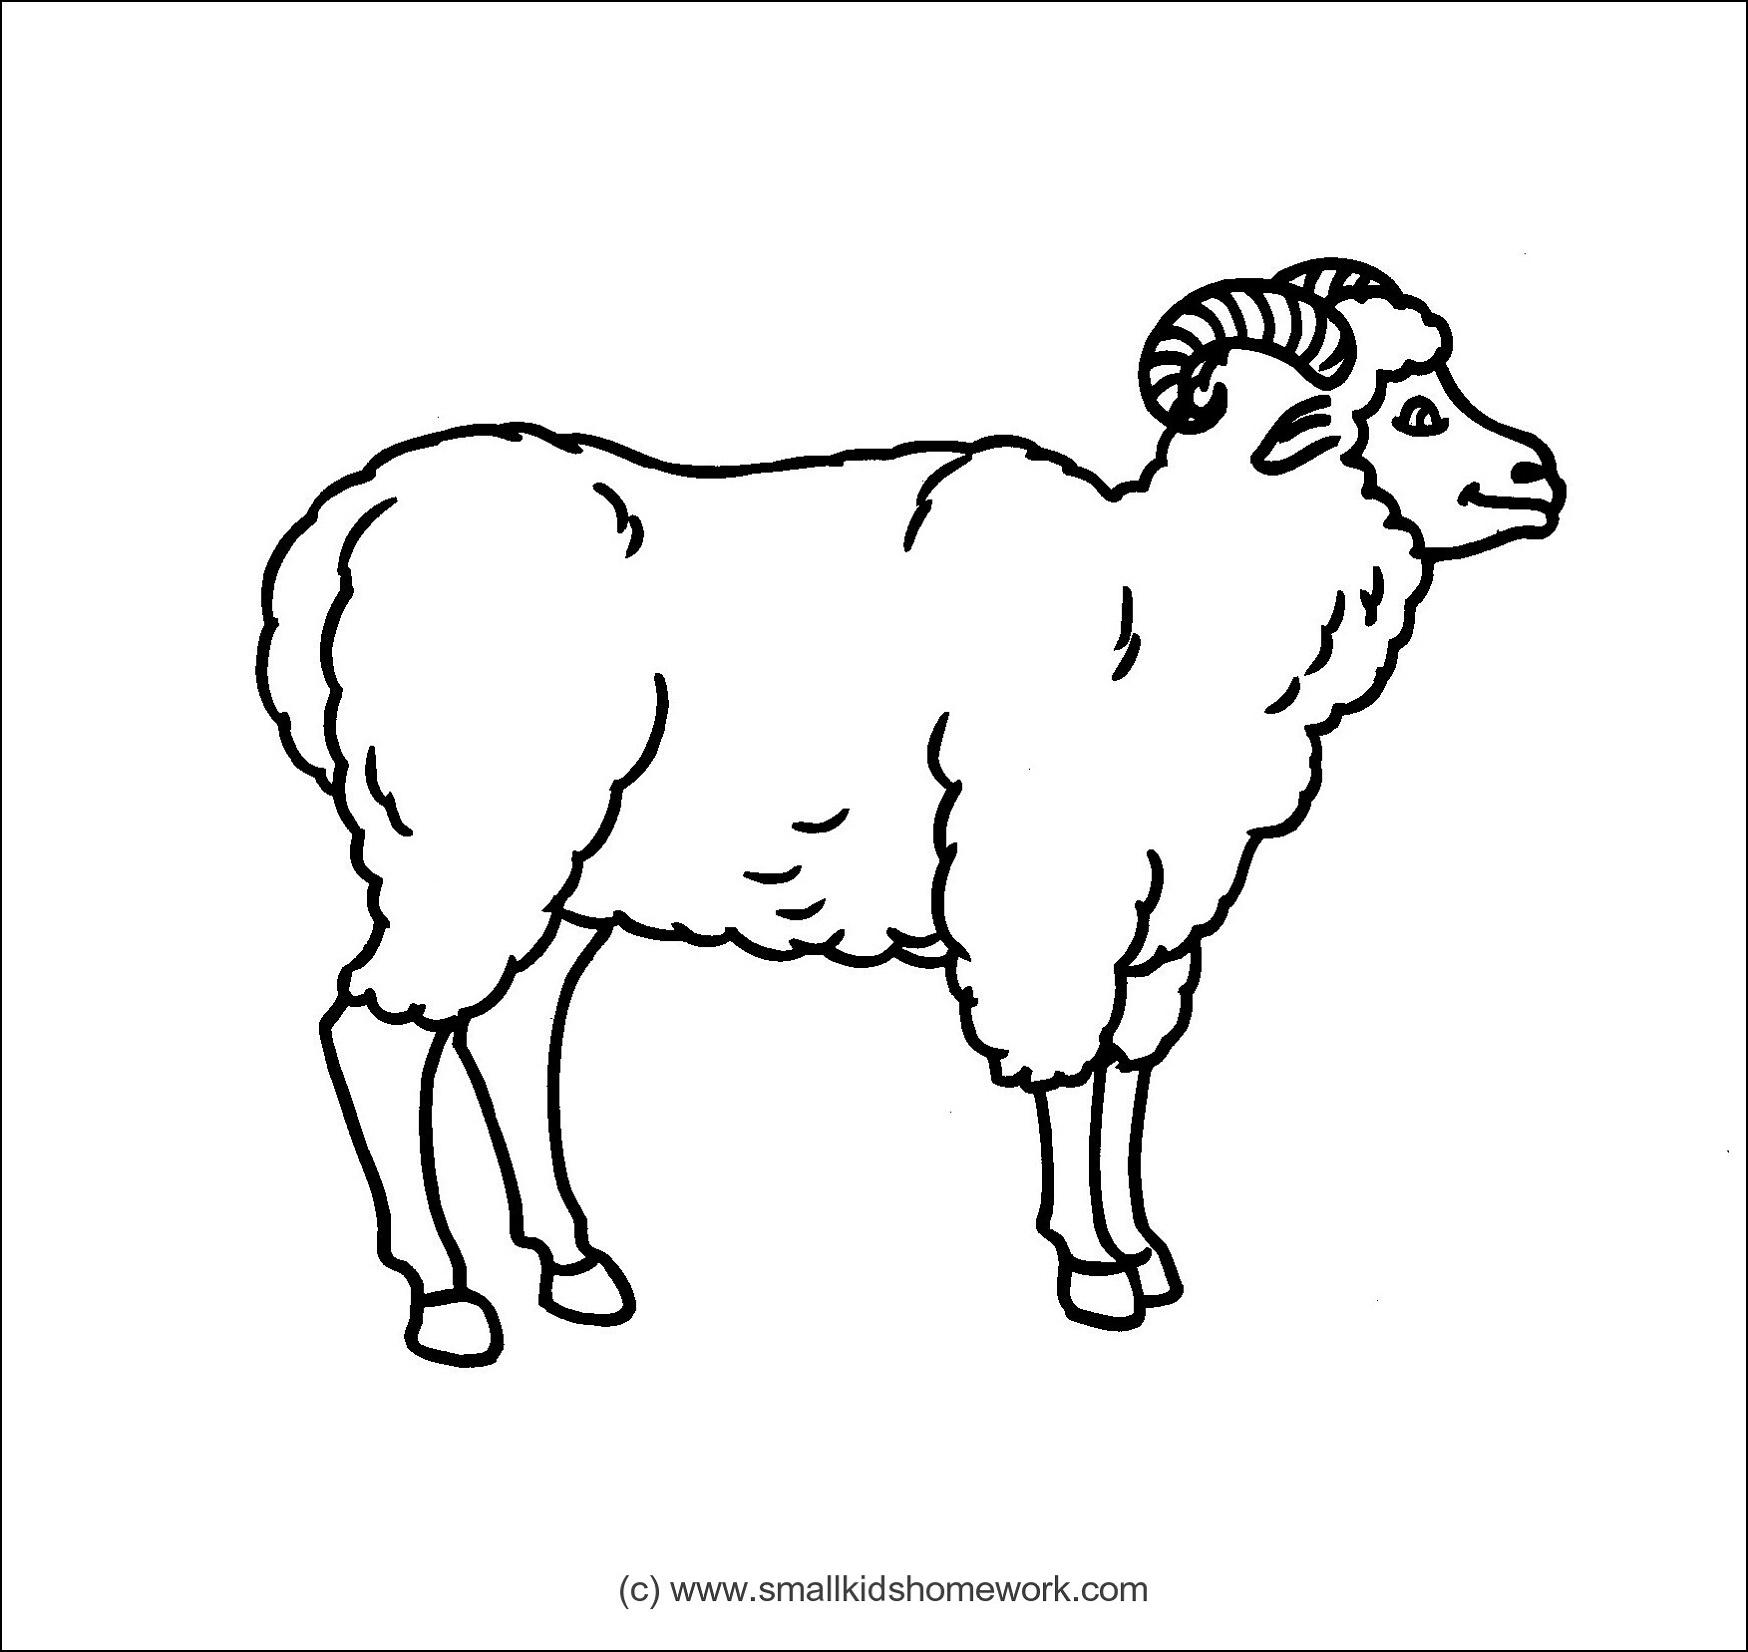 Lamb Outline Drawing at GetDrawings.com | Free for personal use Lamb ... for lamb drawing outline  199fiz